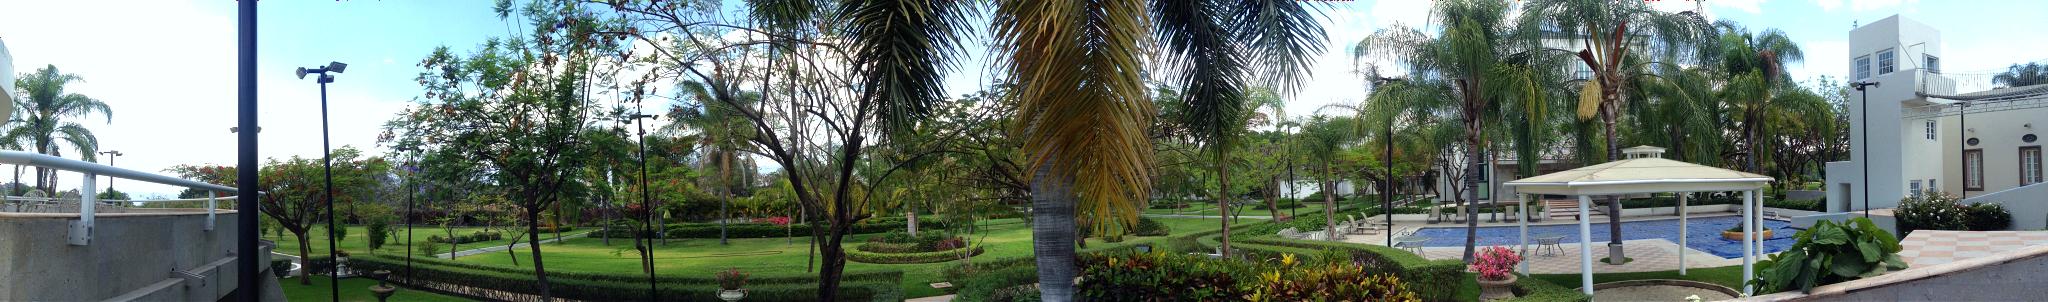 Jardines Villa toscana.jpg